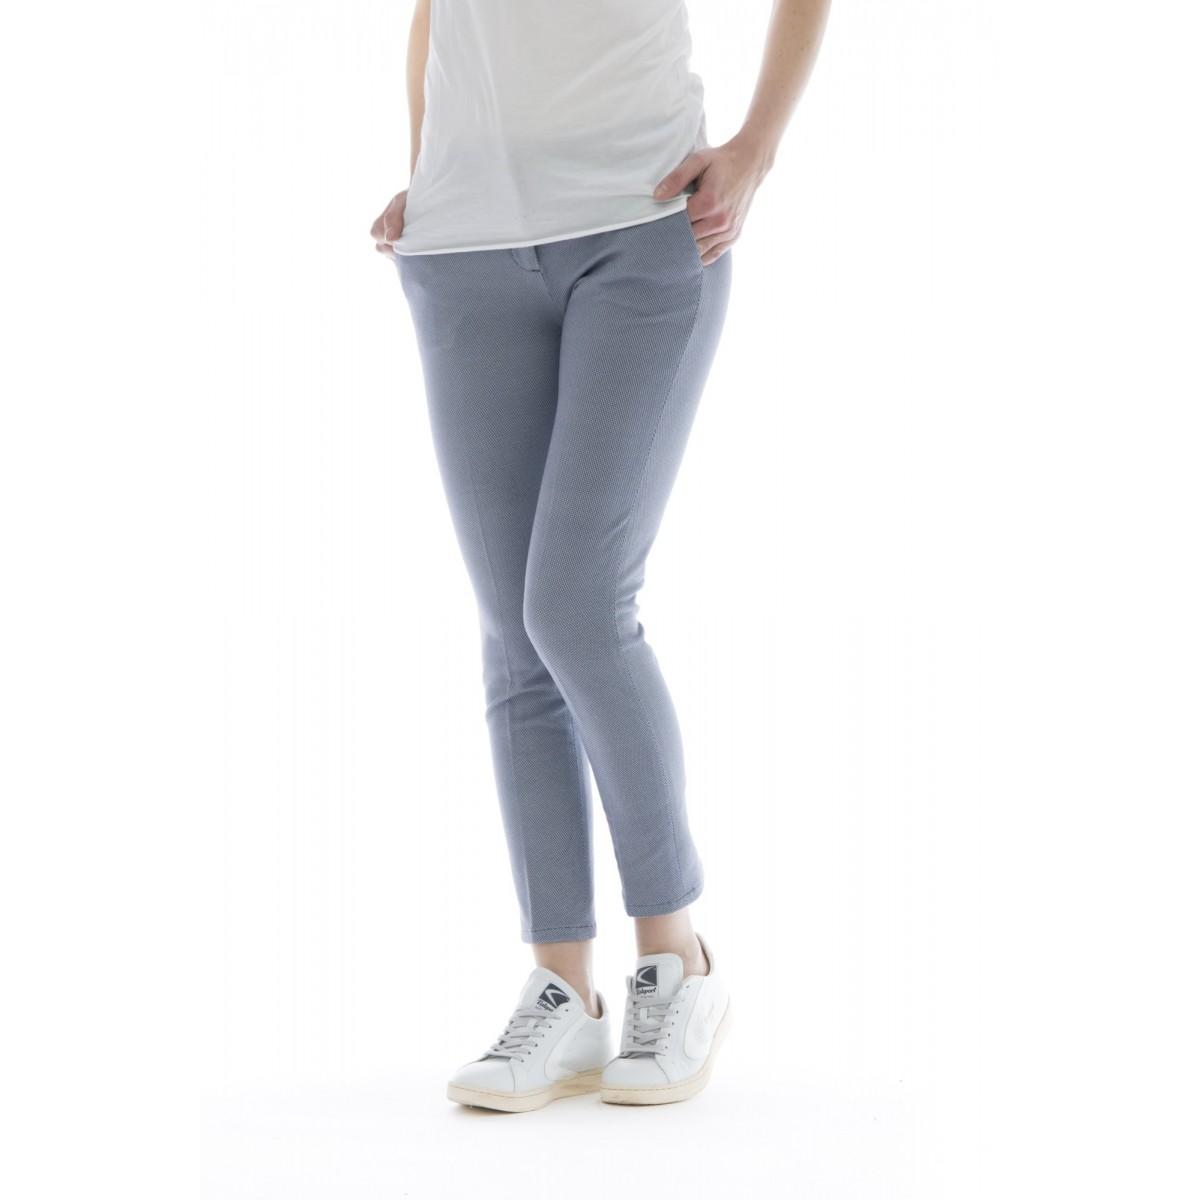 Pantalone donna - Fd1079 pantalone jersey stampato